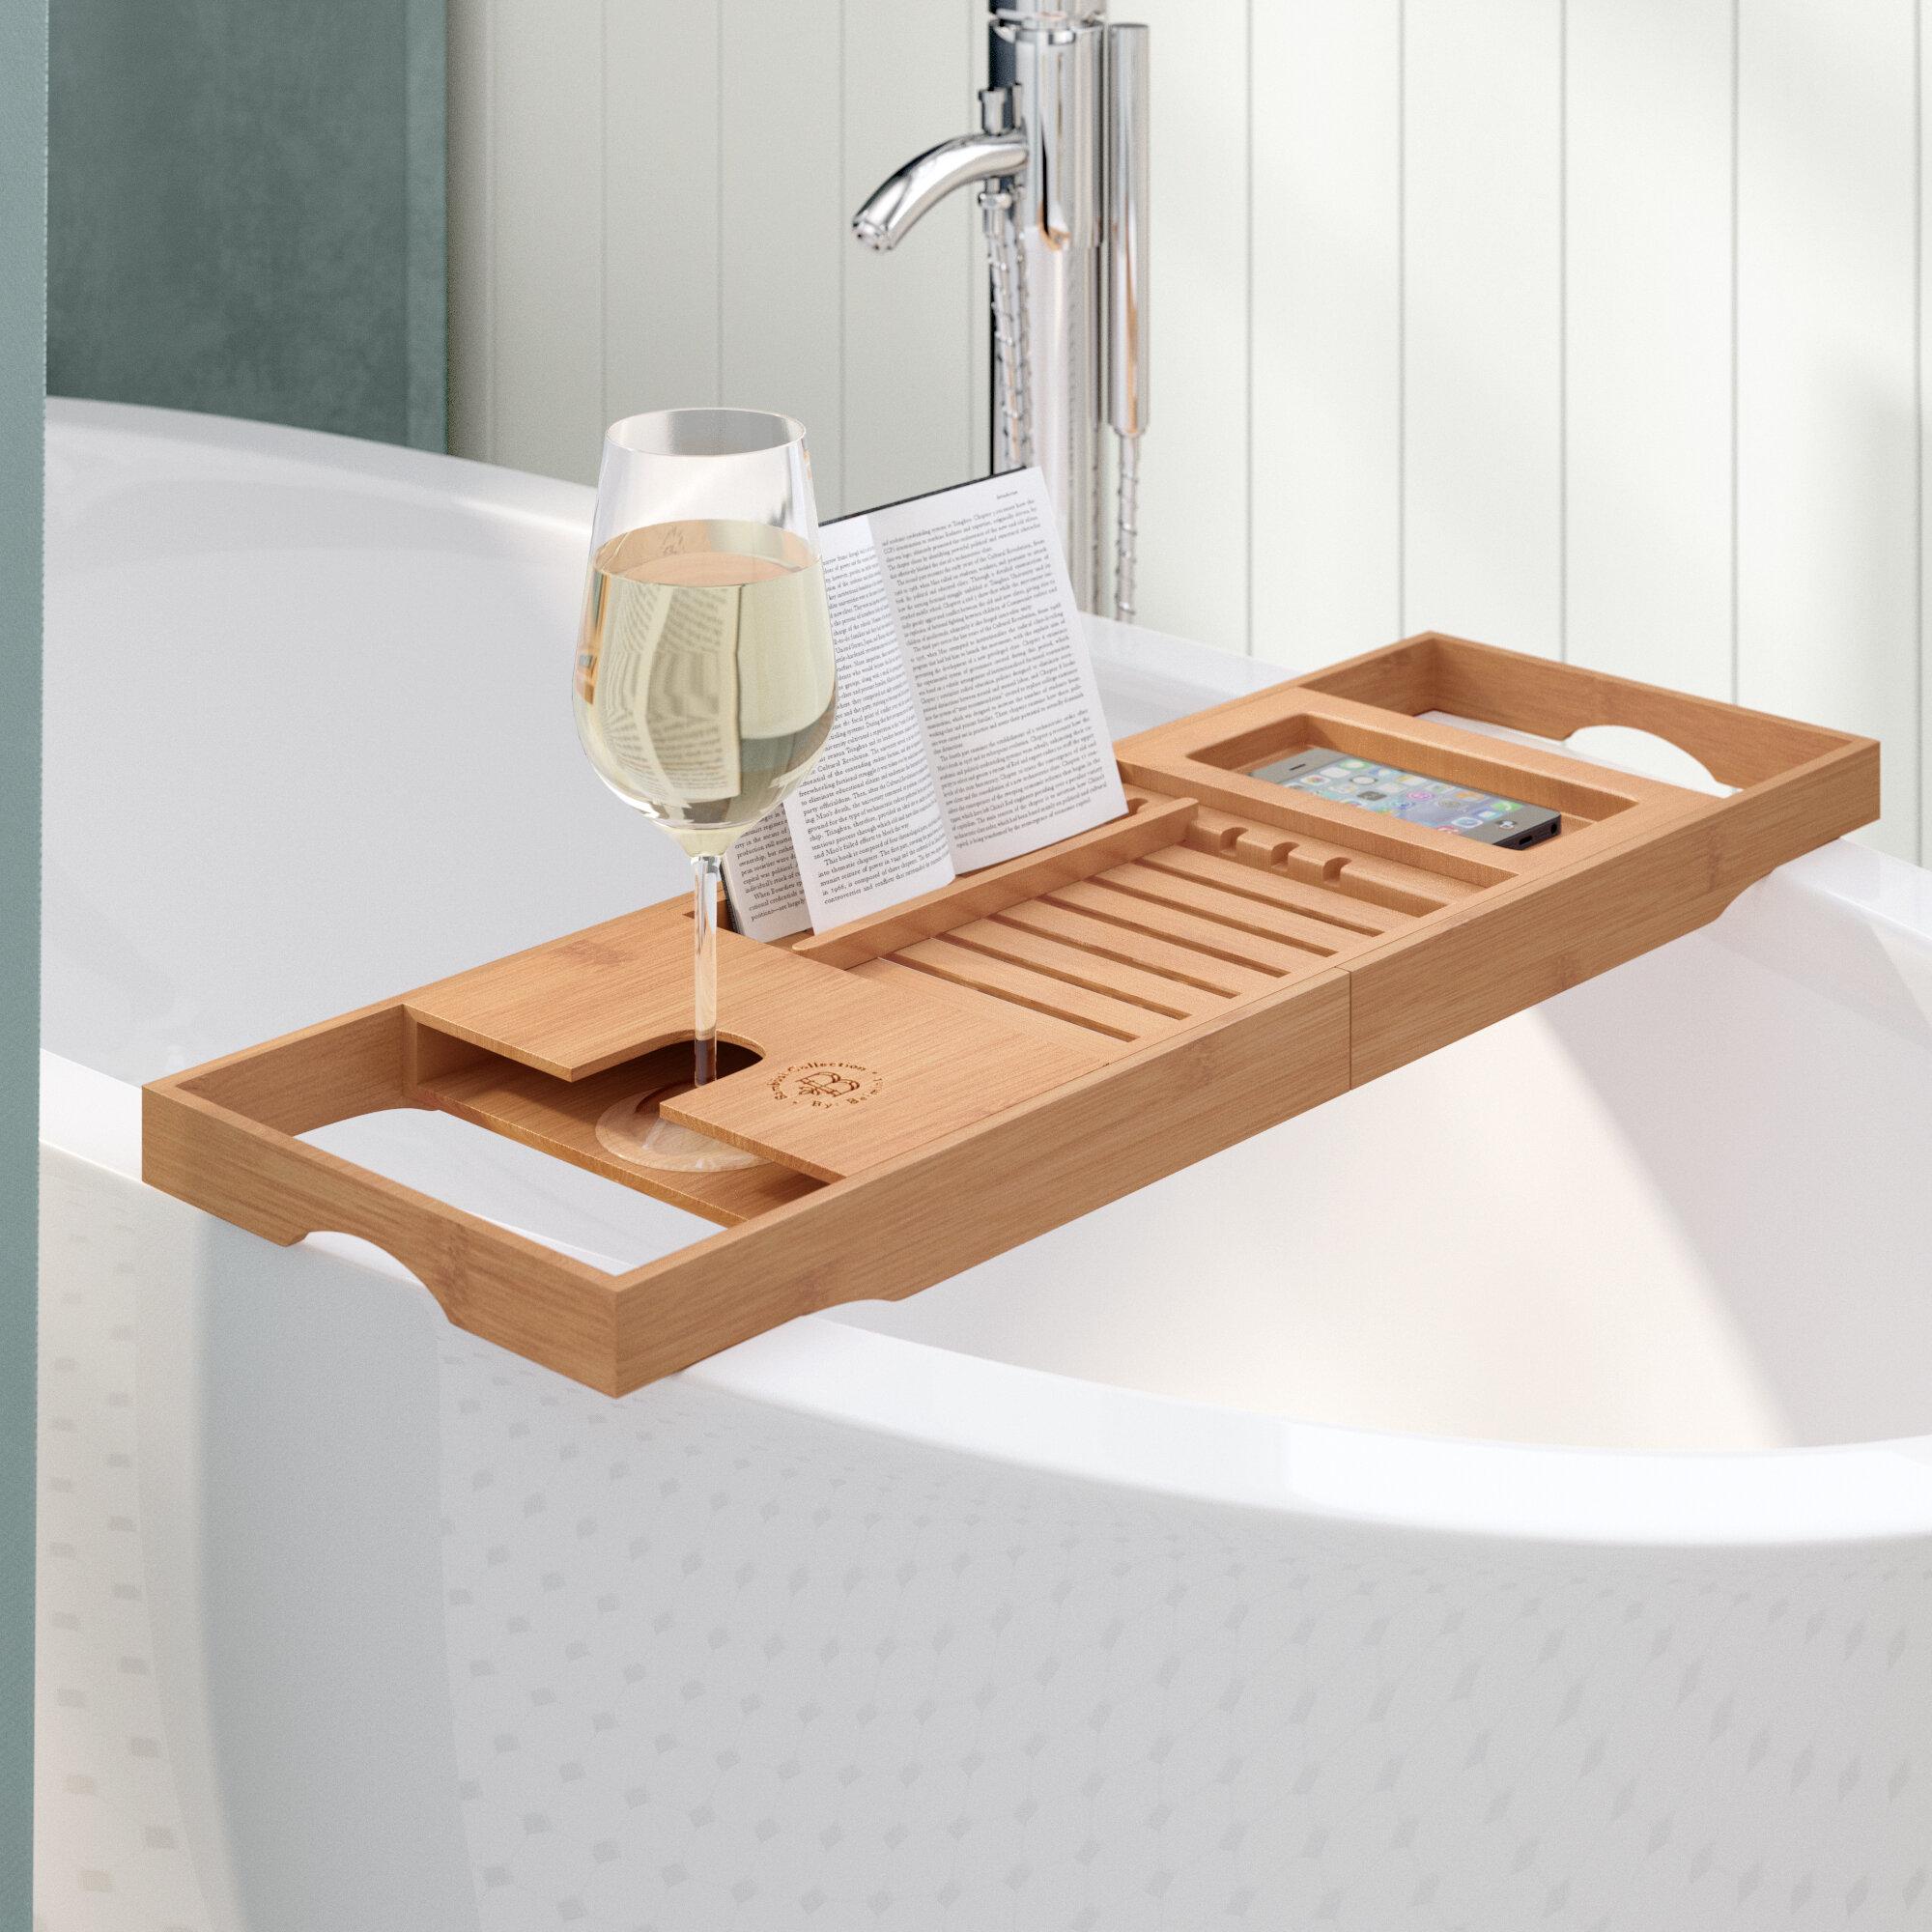 The Twillery Co Elledge Bath Caddy Reviews Wayfair